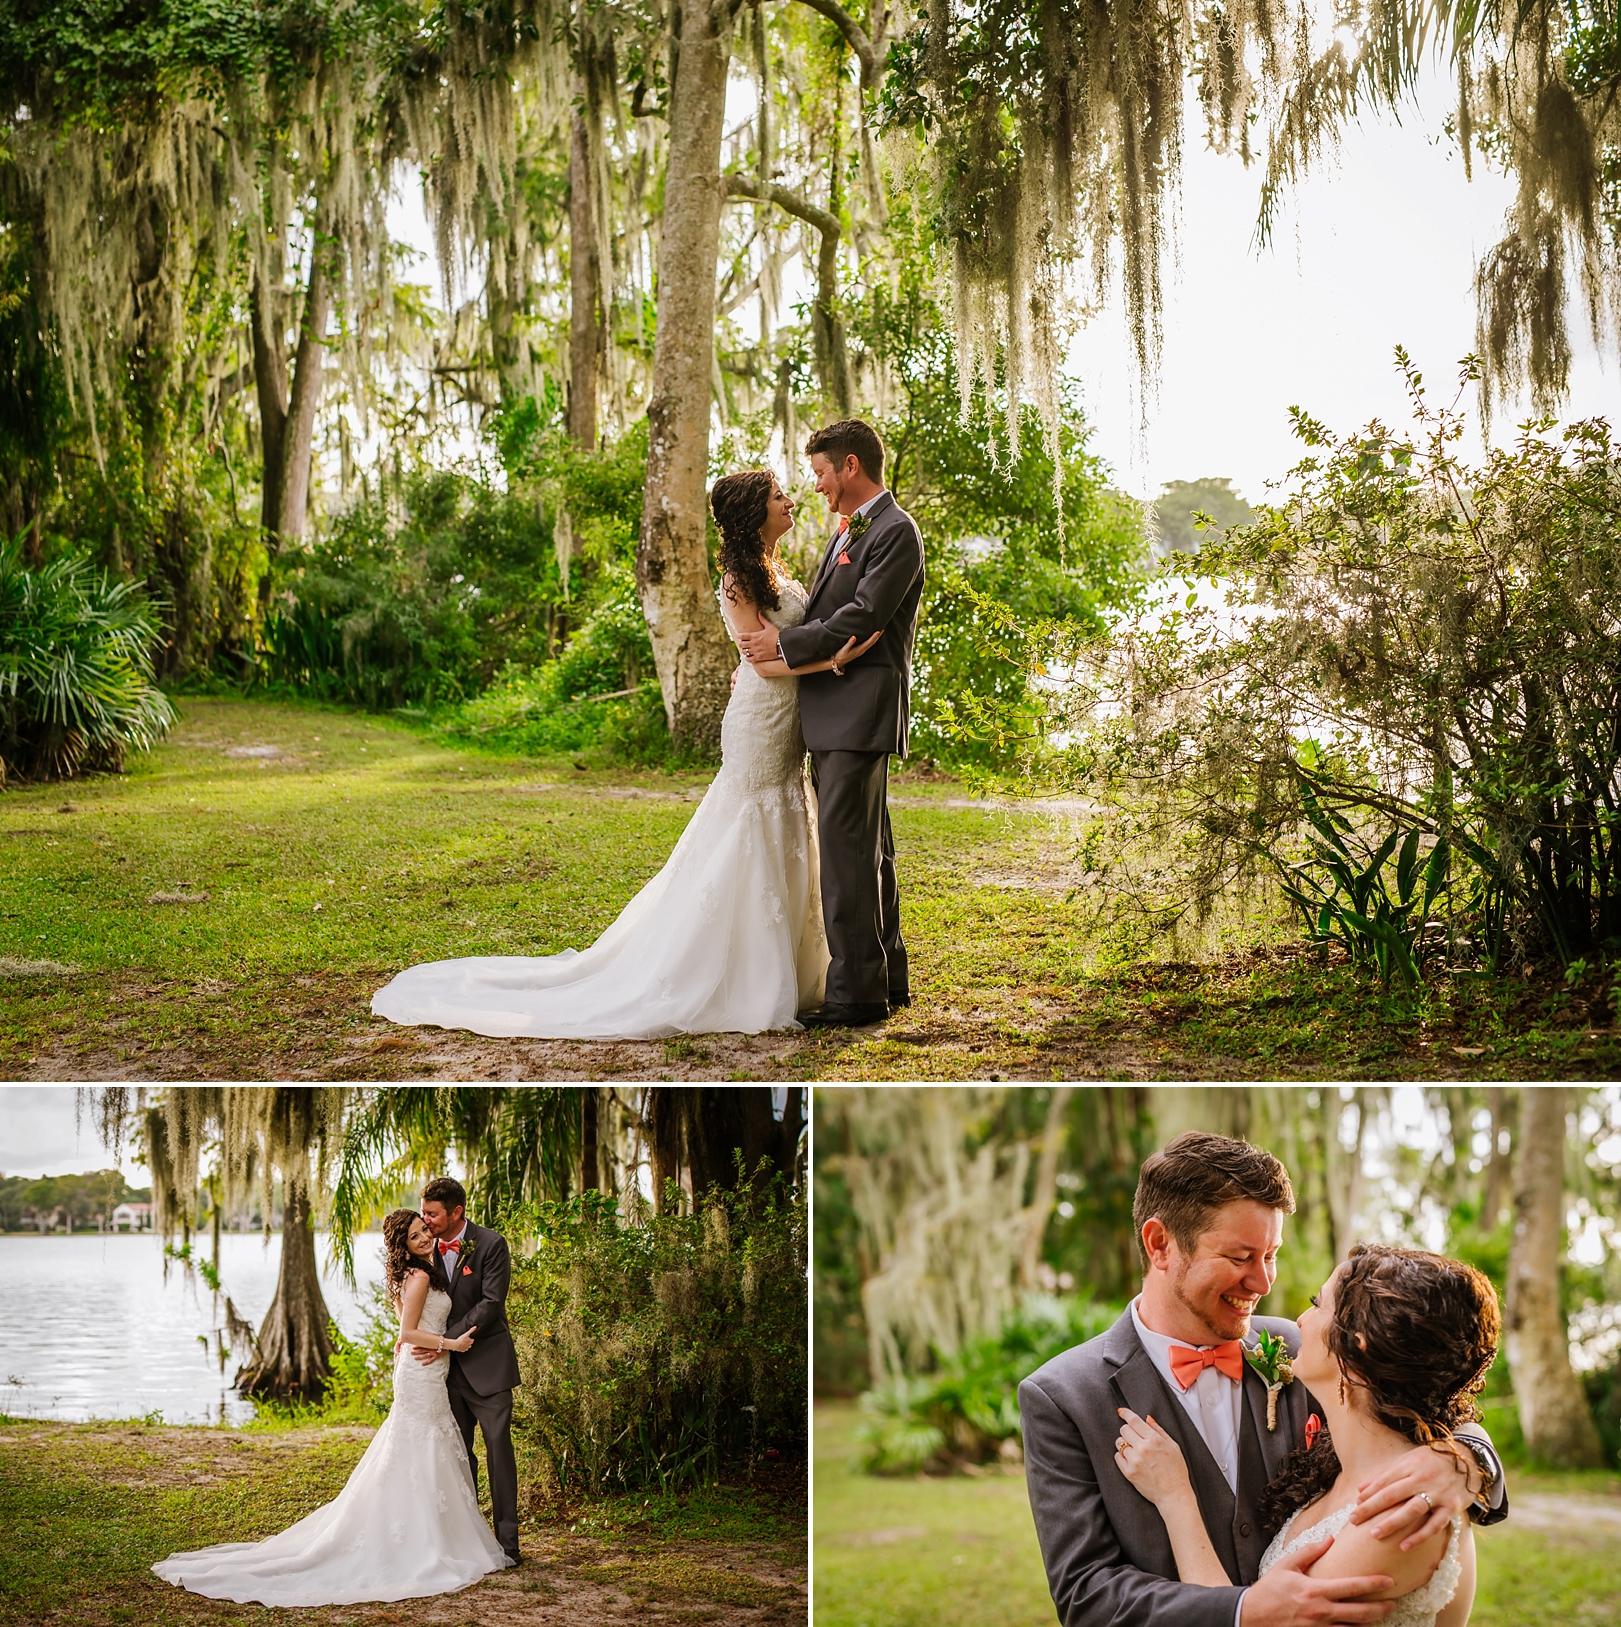 kraft-azalea-gardens-stylish-elopment-wedding-photography_0020.jpg